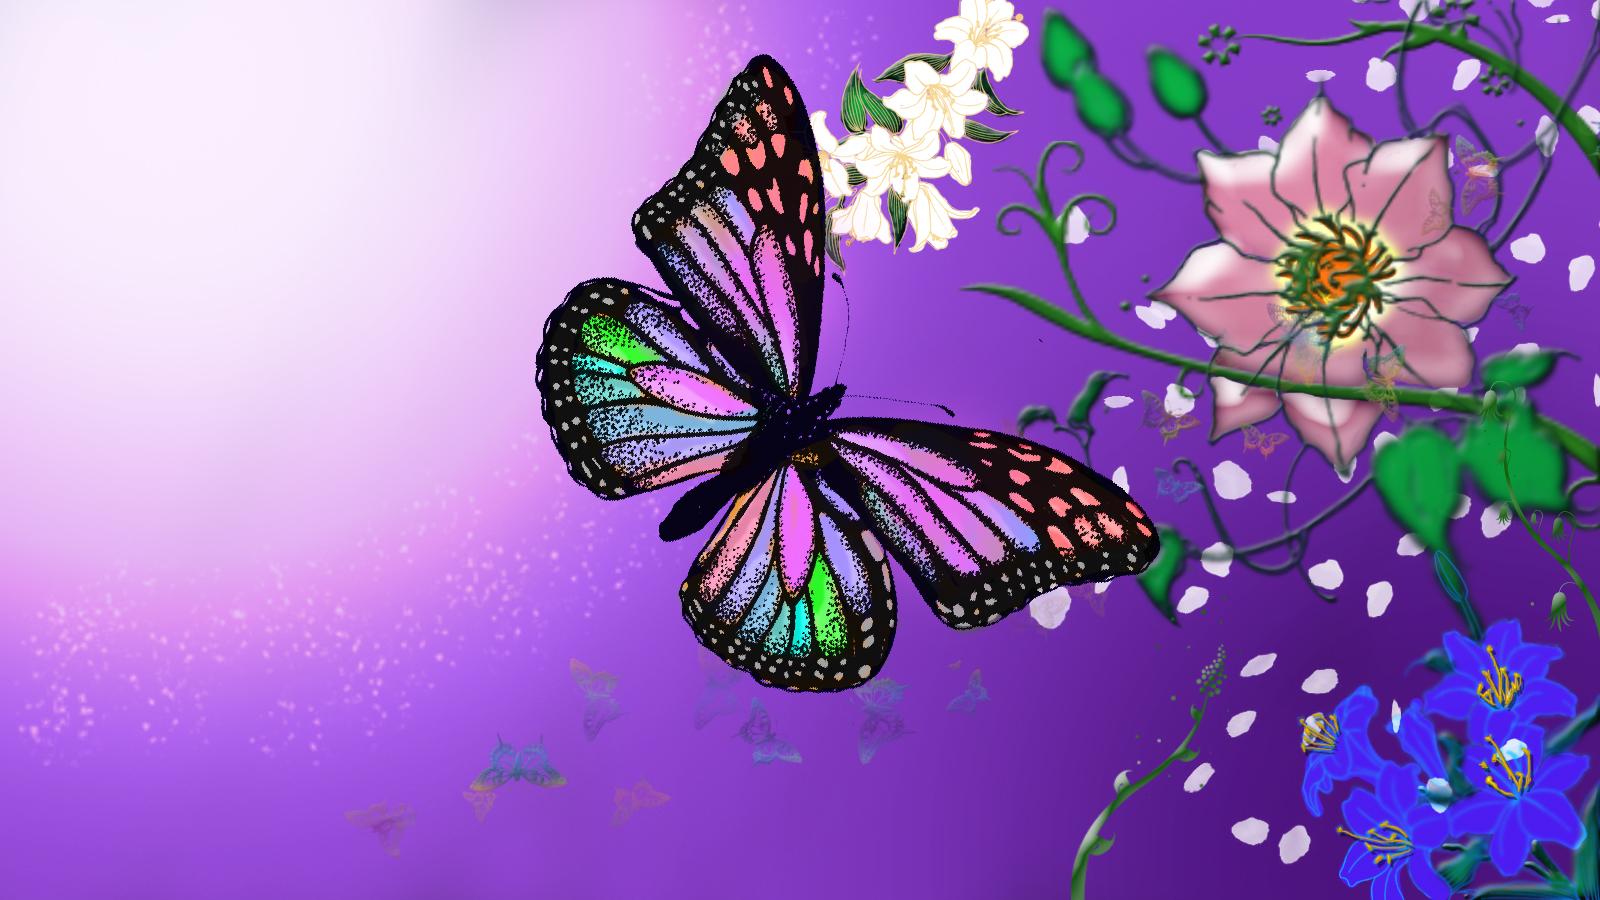 [45+] Wallpaper Butterflies and Flowers on WallpaperSafari